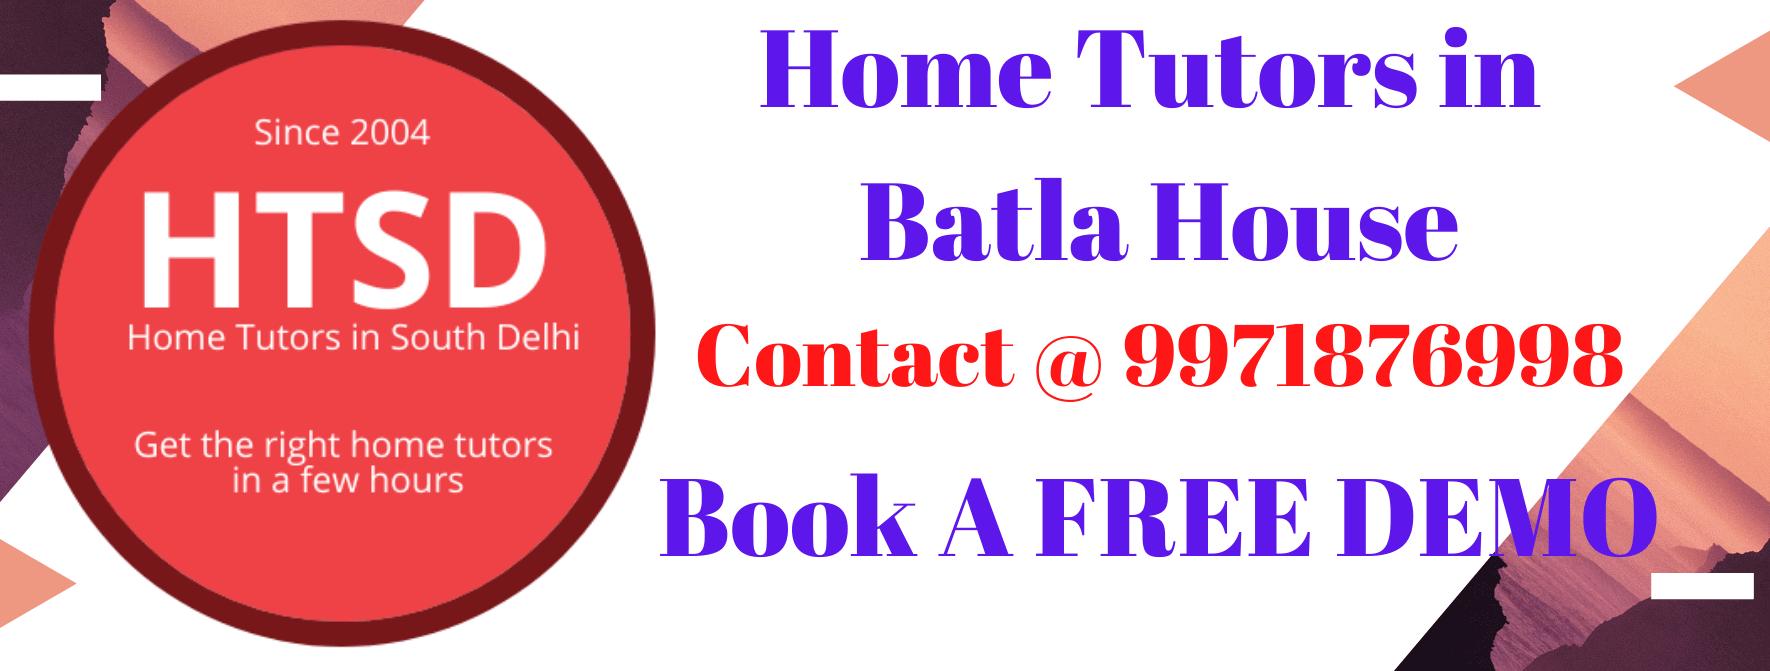 Home Tutors in Batla House